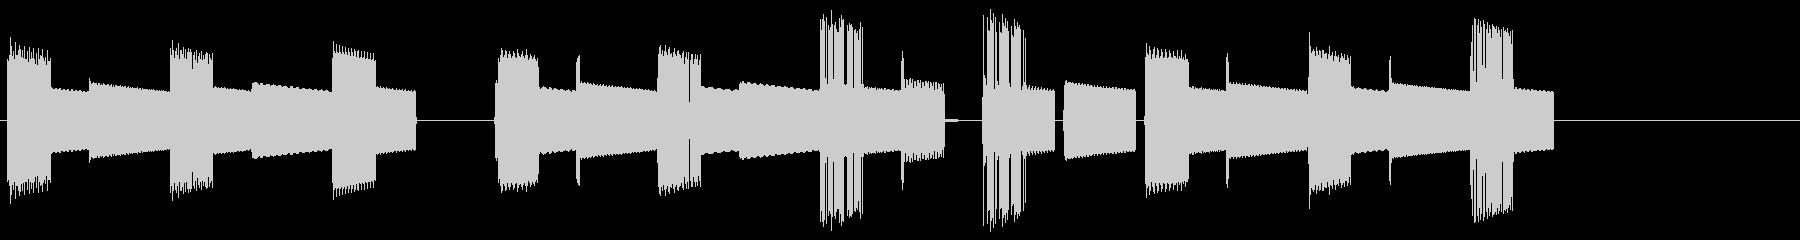 8bit場面転換効果メロディ1の未再生の波形